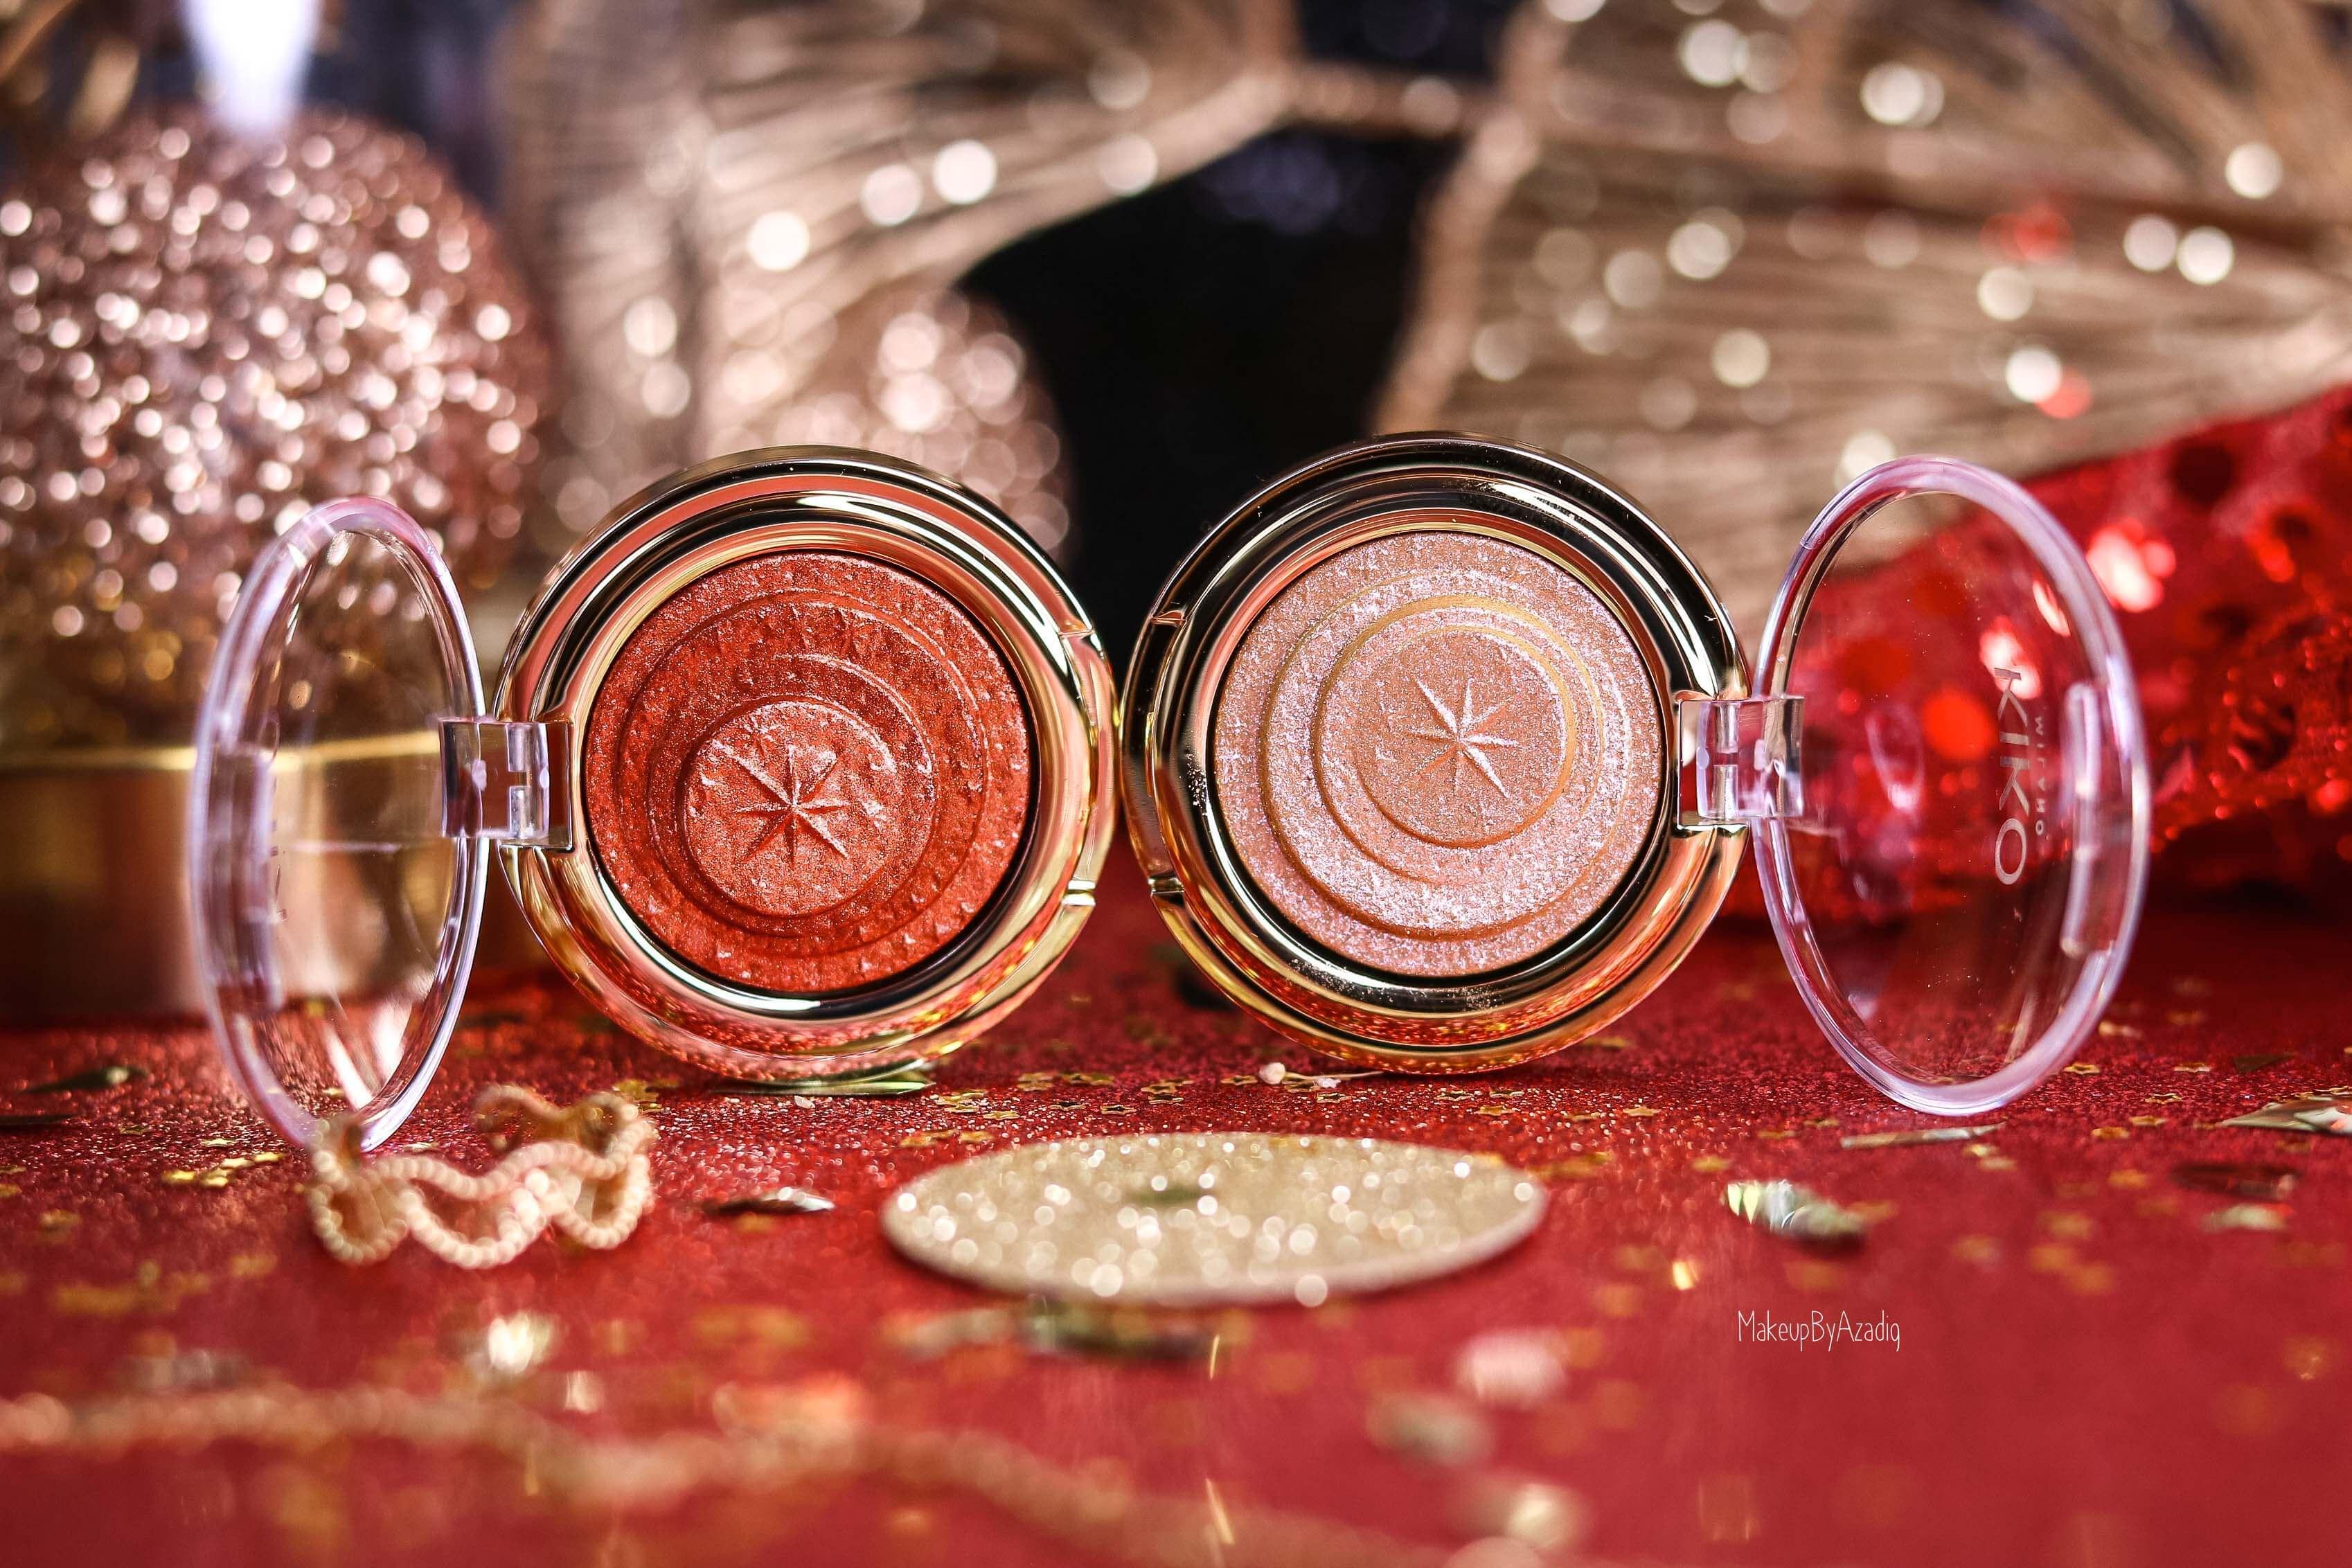 revue-collection-noel-kiko-milano-troyes-magical-holiday-rouge-levres-fard-paupieres-makeupbyazadig-avis-prix-swatch-paillete-2019-eyeshadows